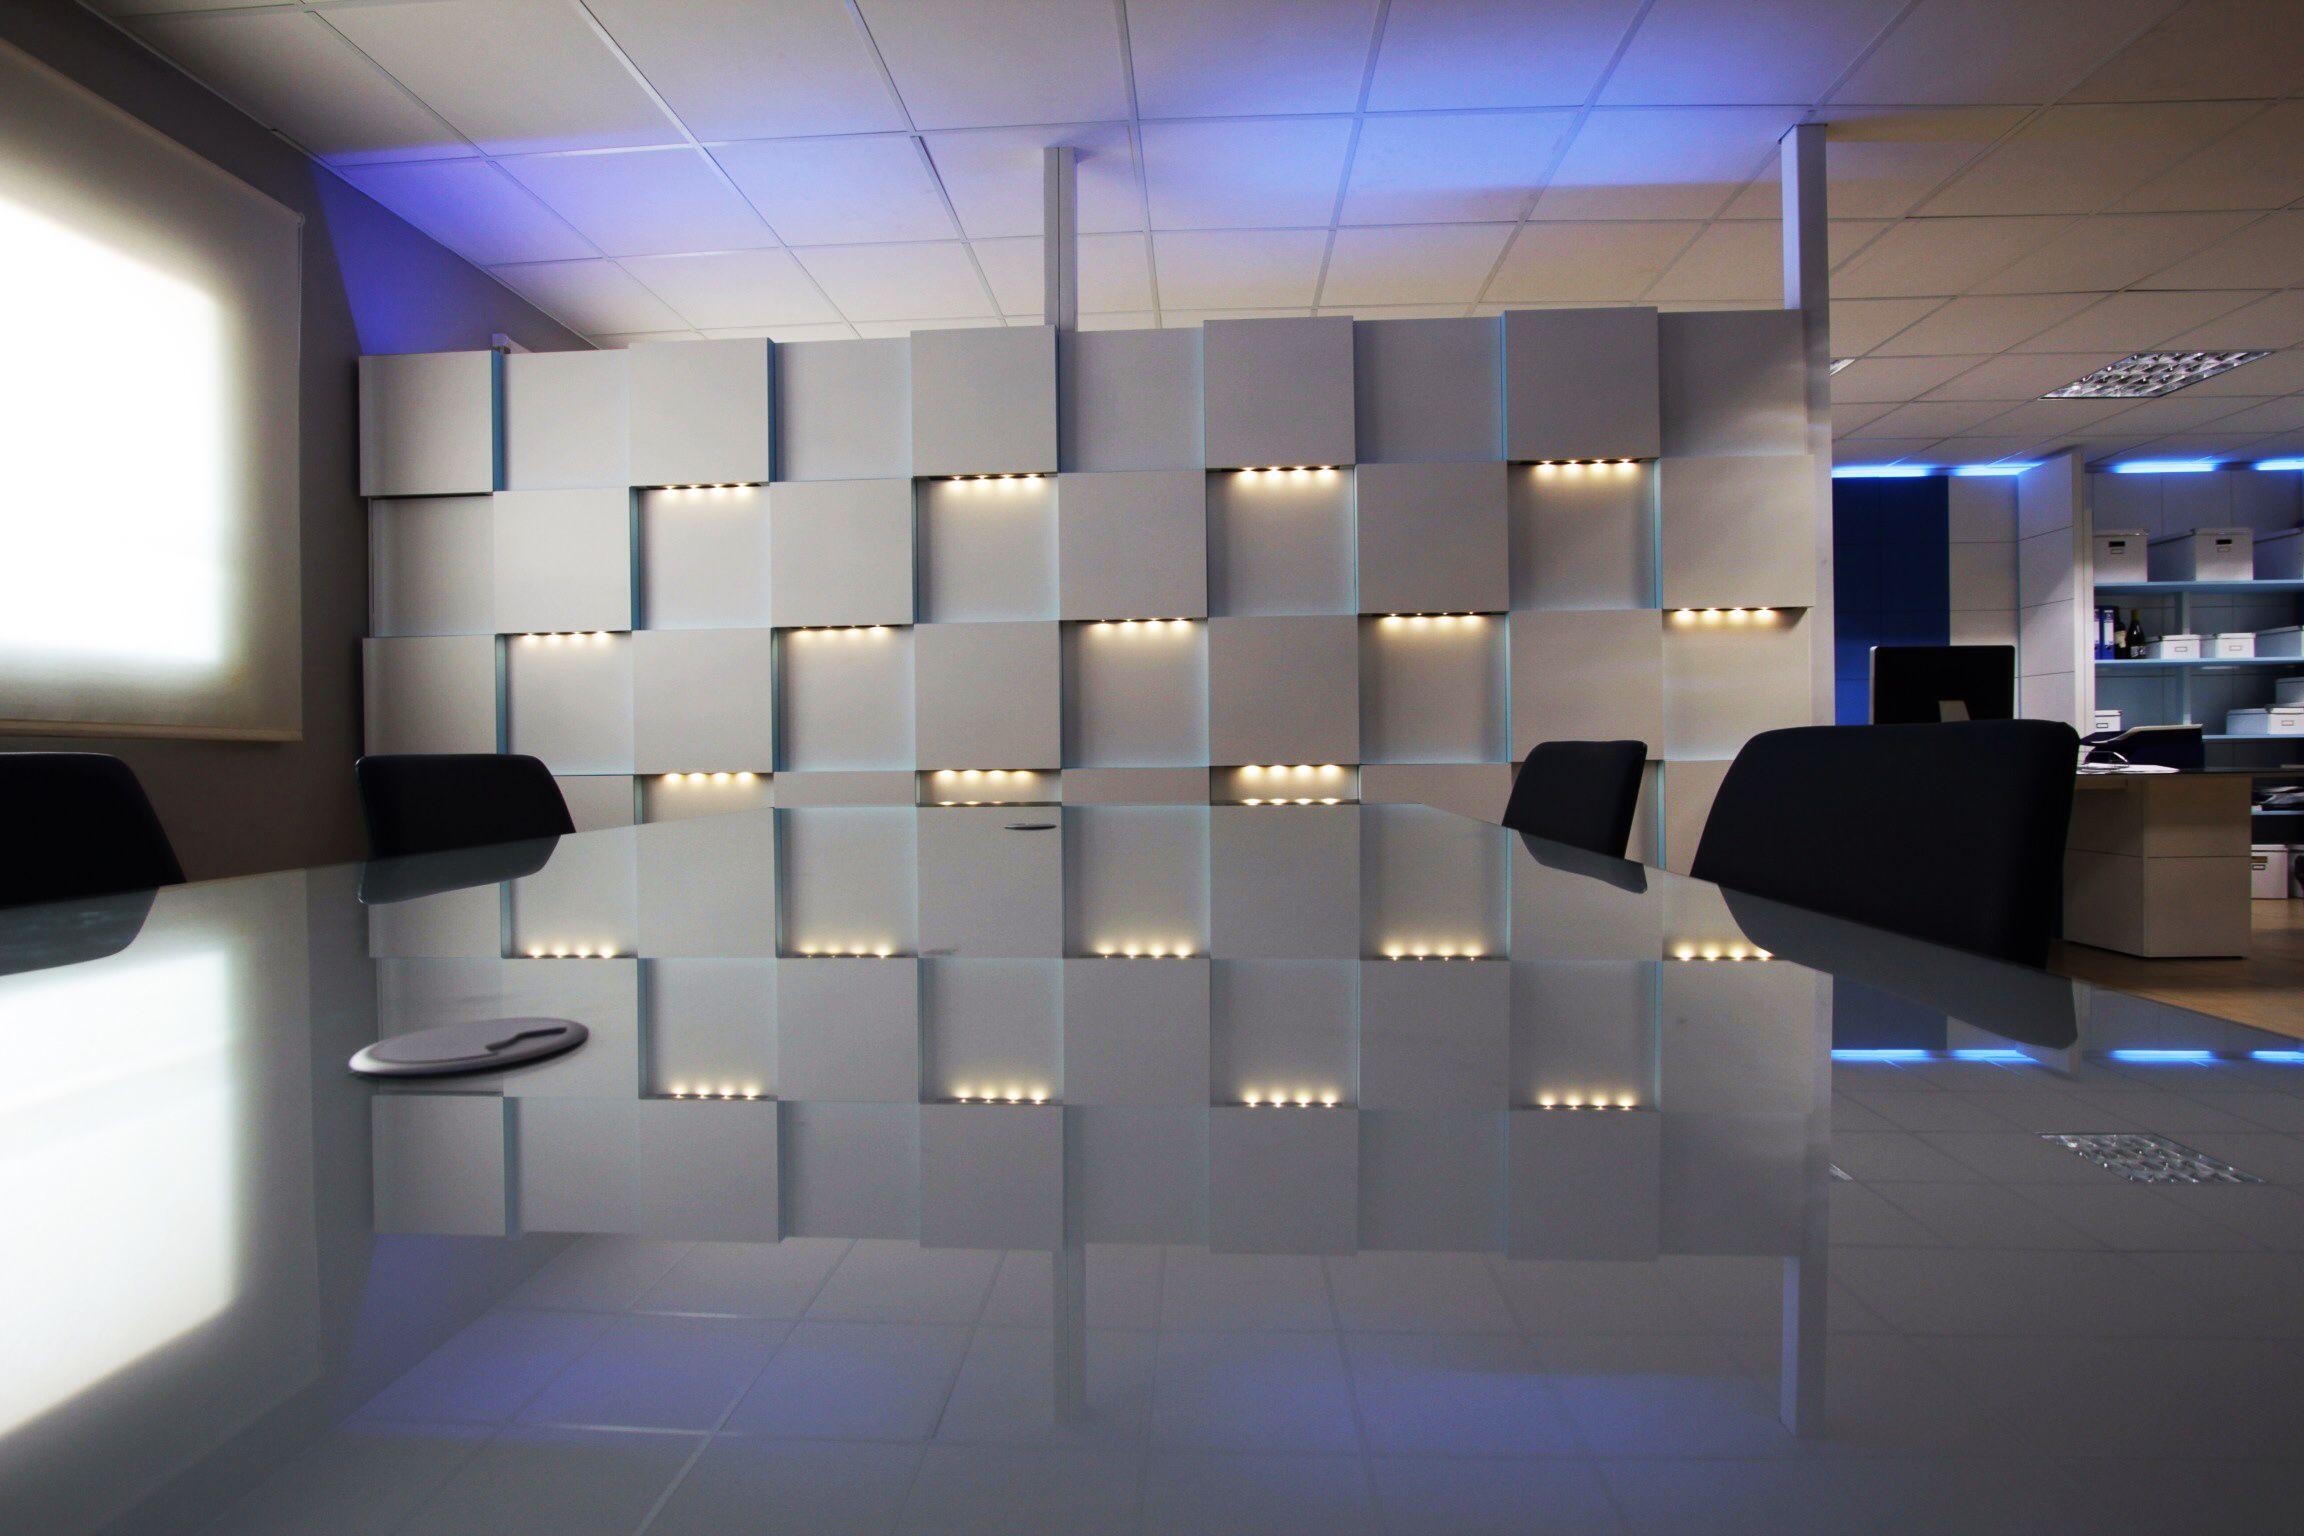 Tabique separador de ambientes de serastone para oficina for Separadores de oficina